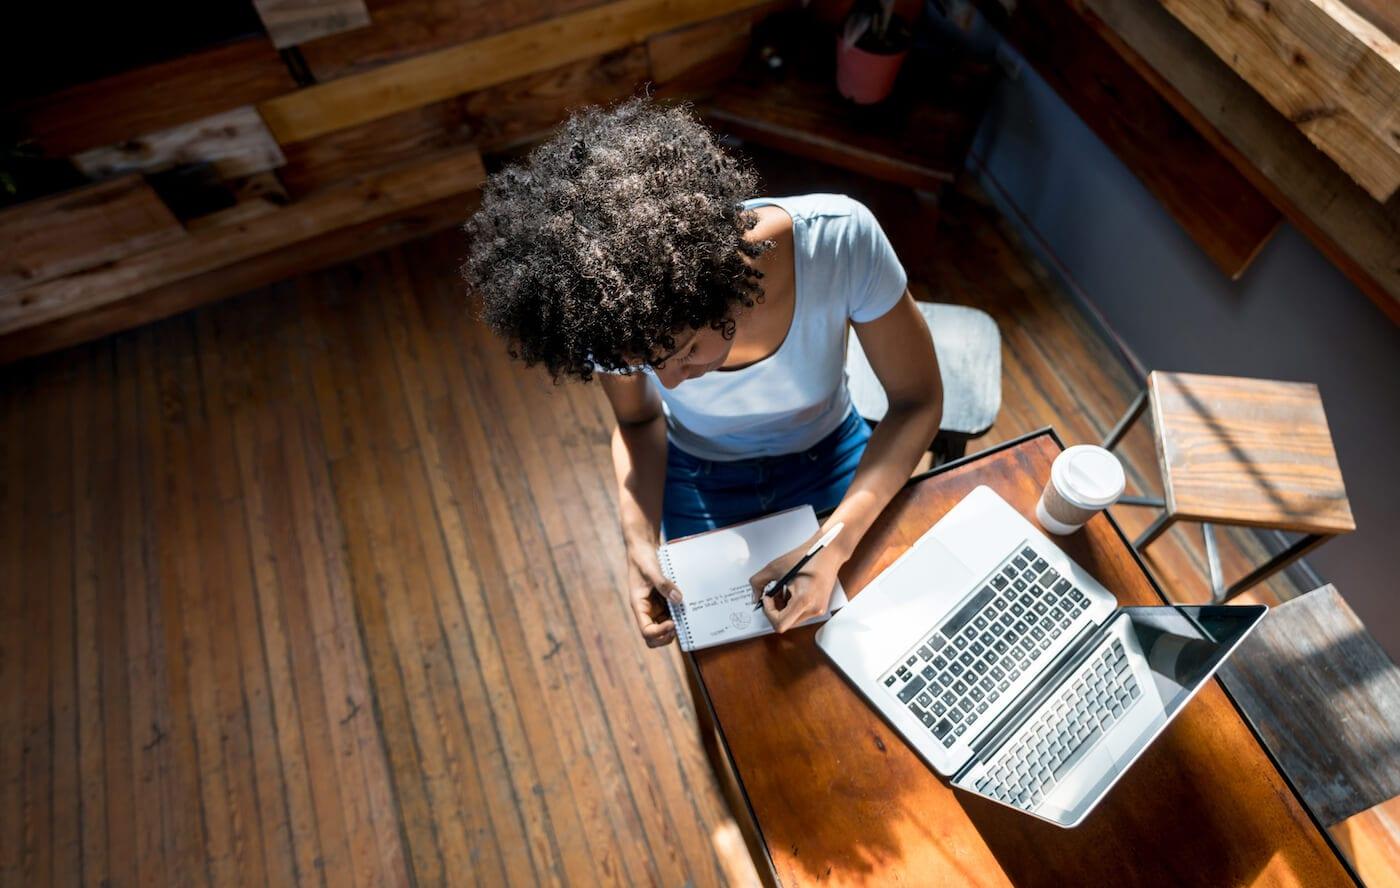 Los-Angeles-intern-housing-apartment-woman-study